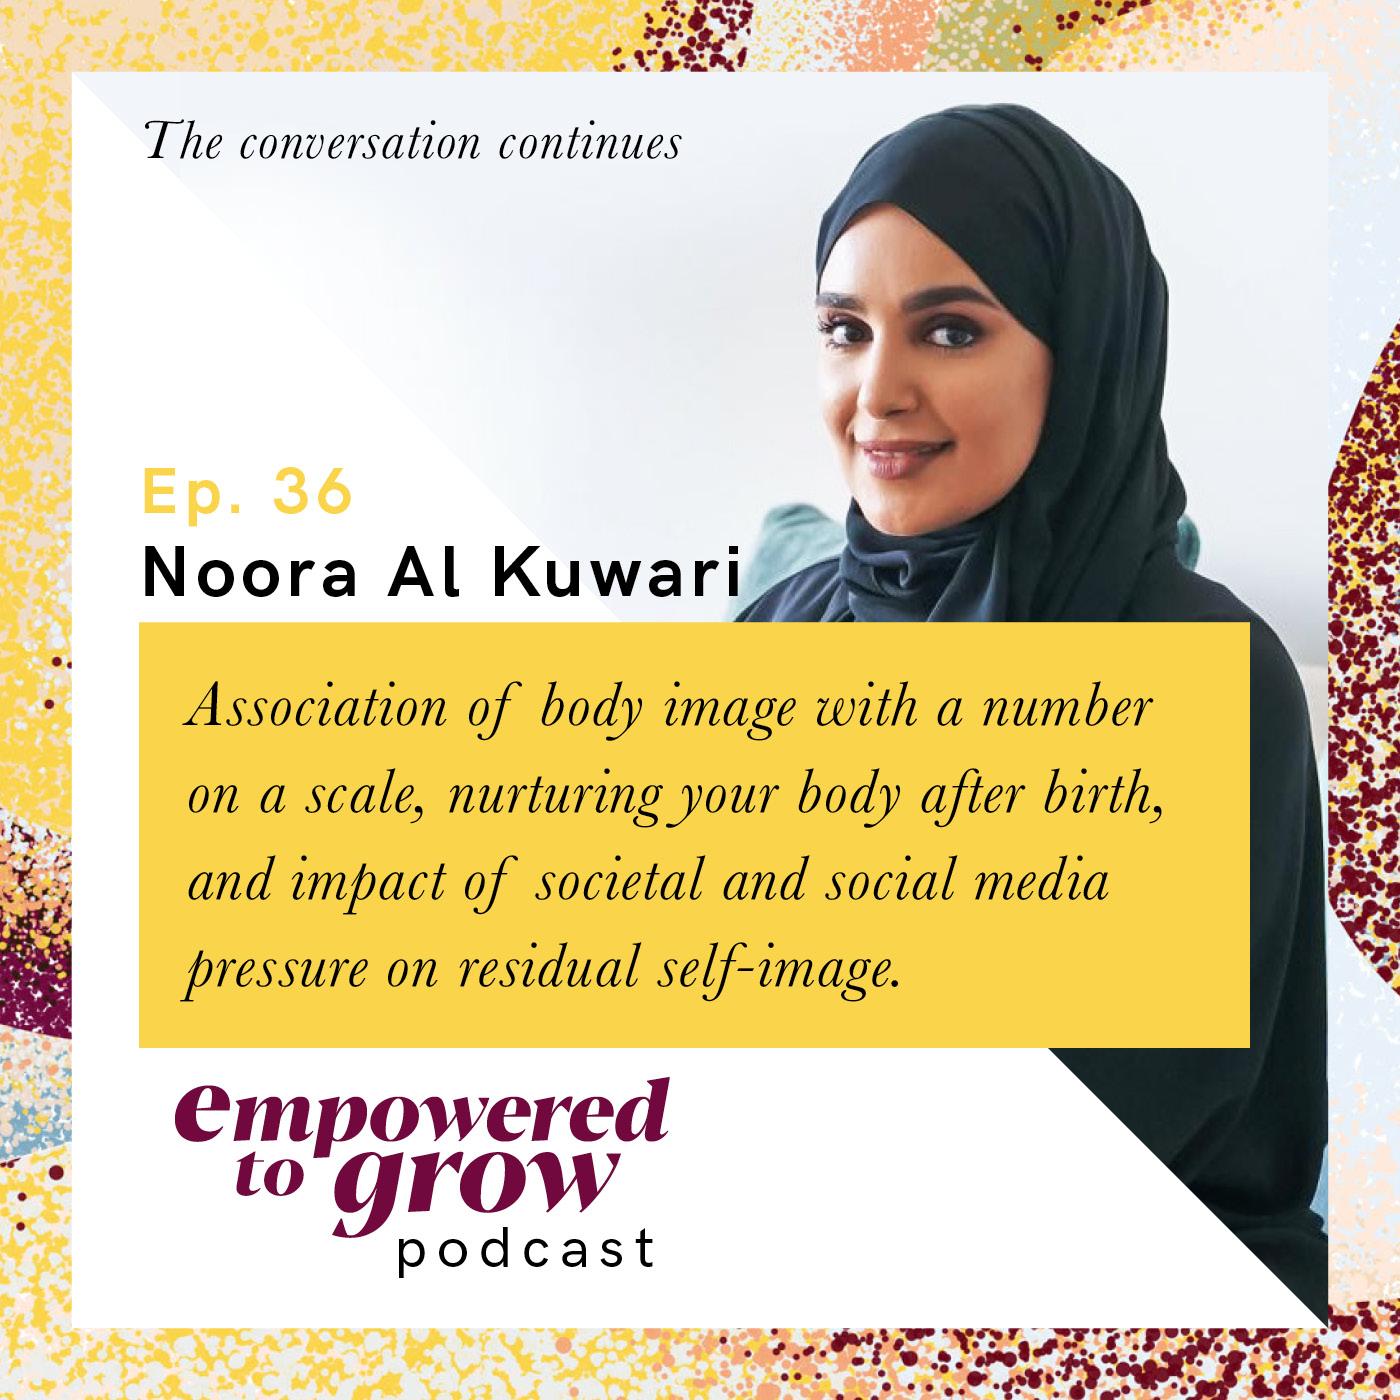 Ep. 36 - Unchartered Discussions - Noora Al Kuwari